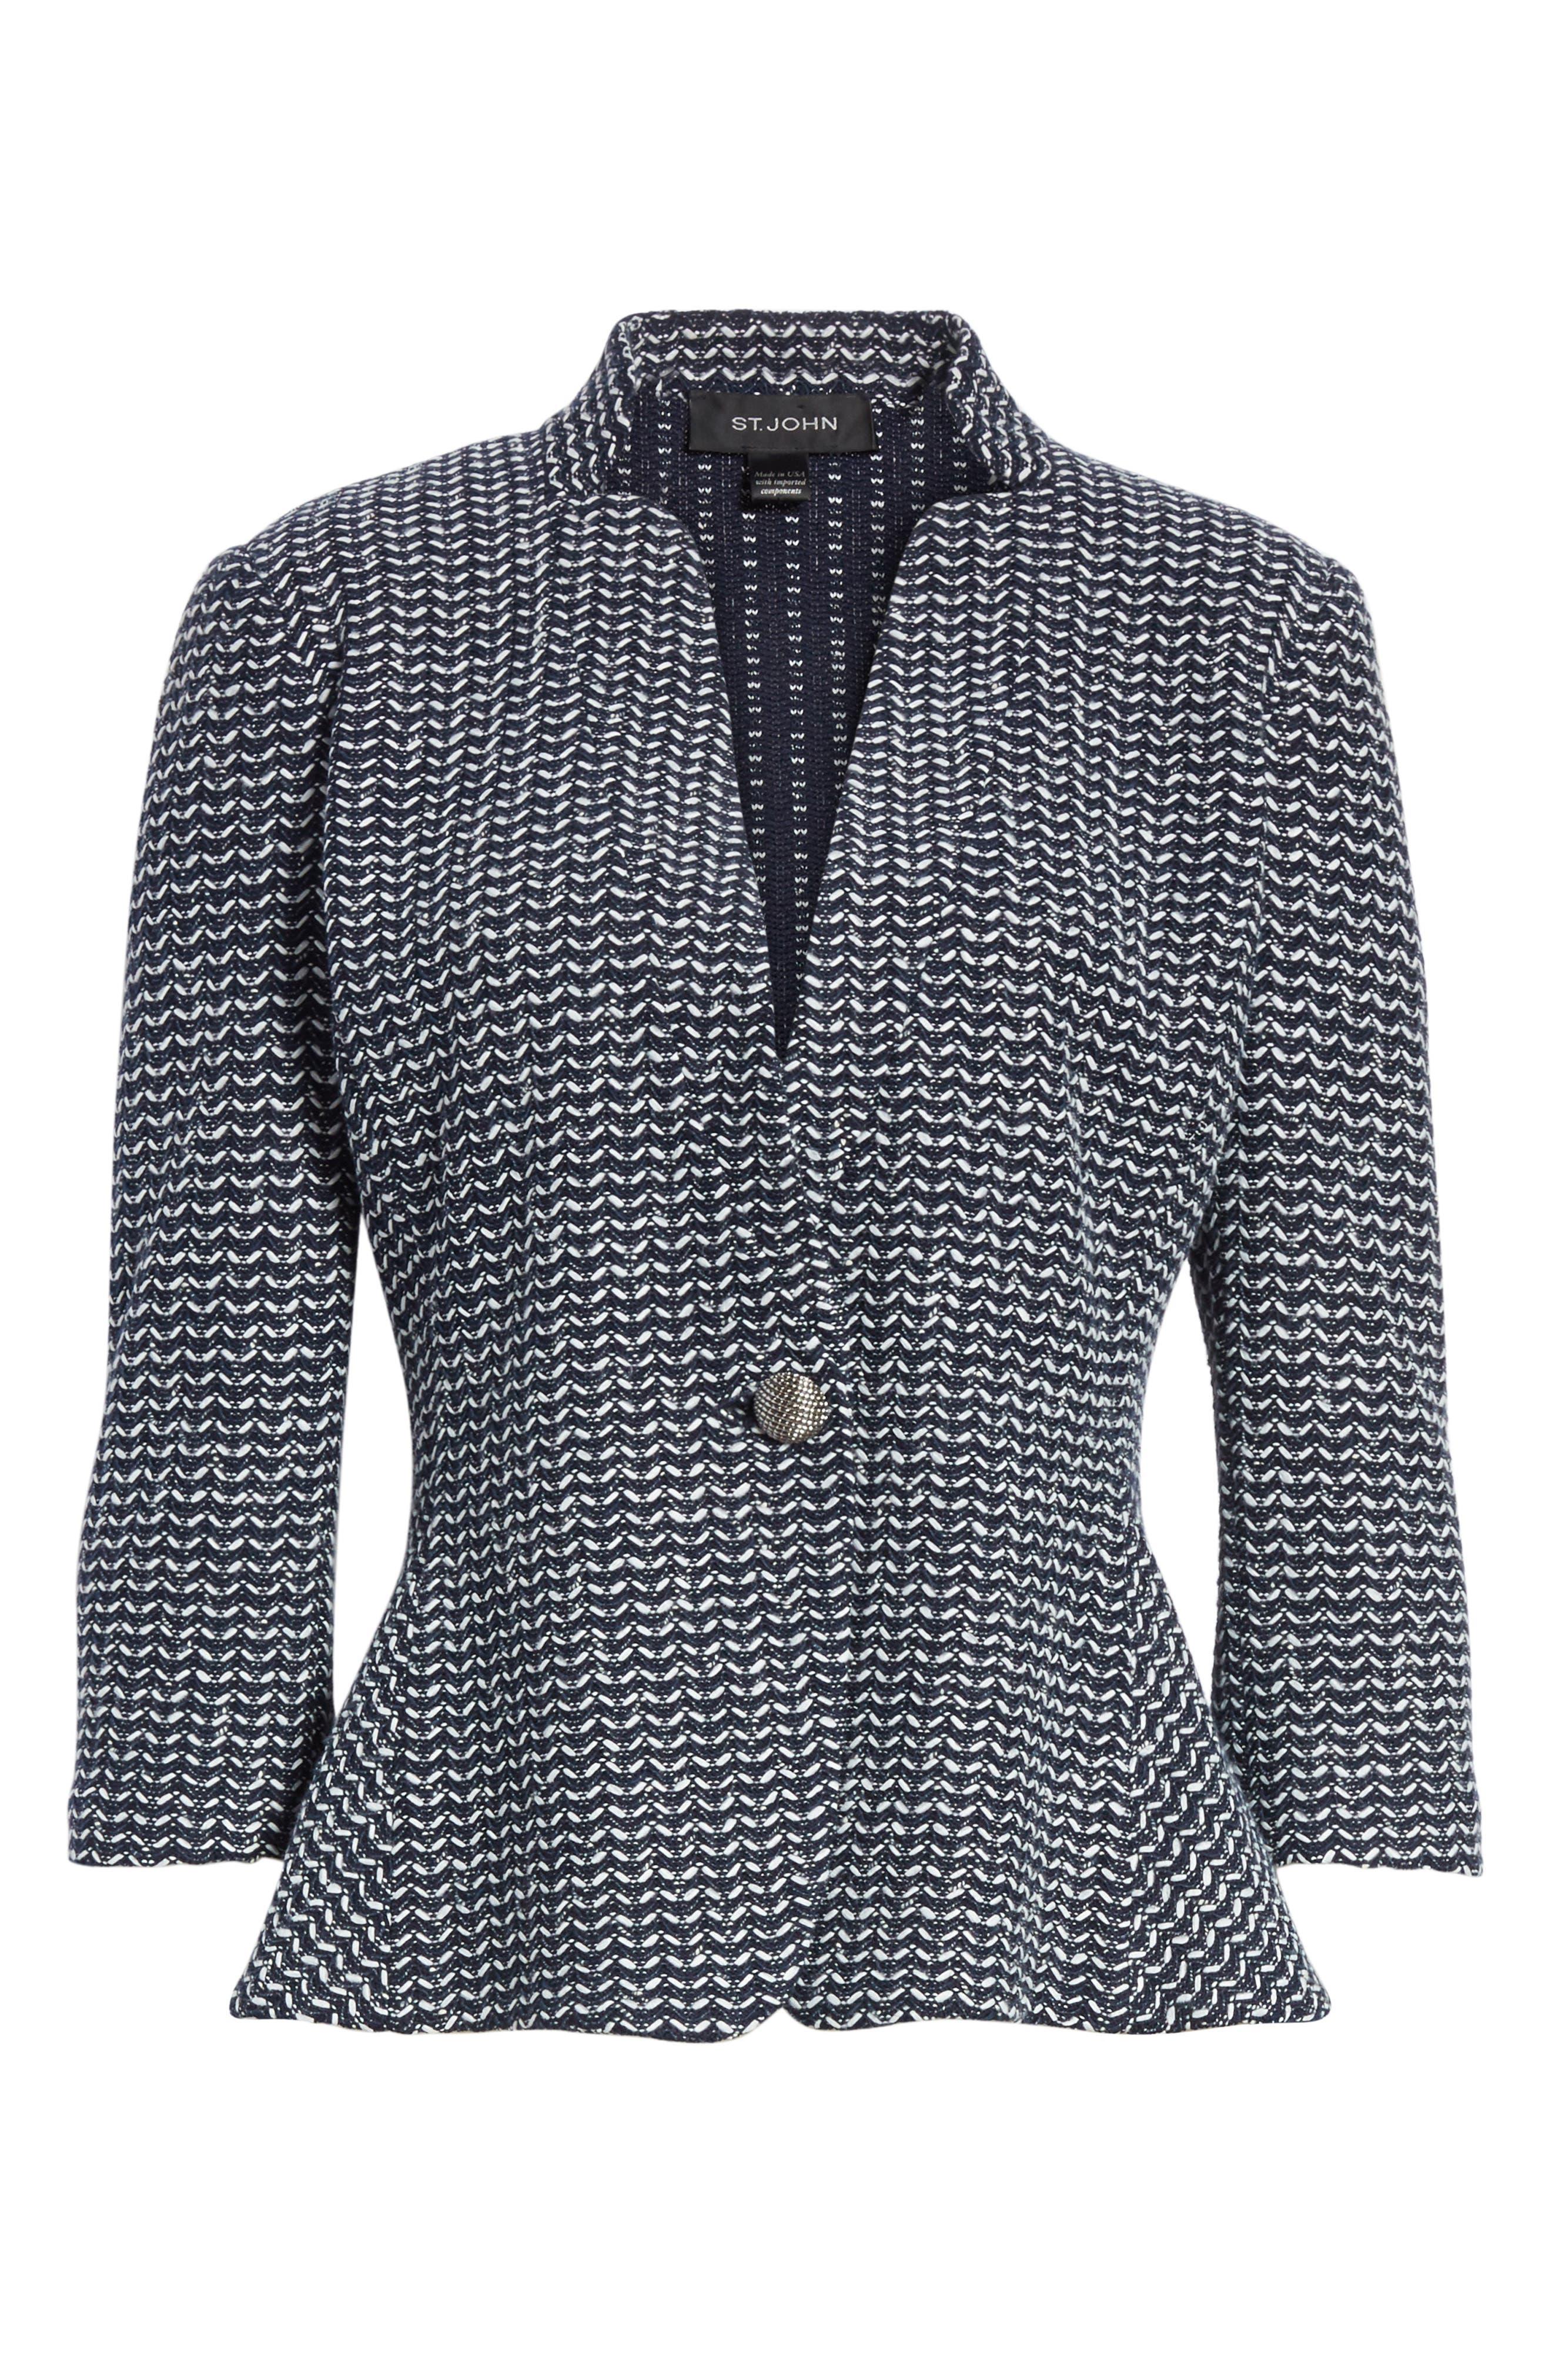 Chevron Knit Jacket,                             Alternate thumbnail 5, color,